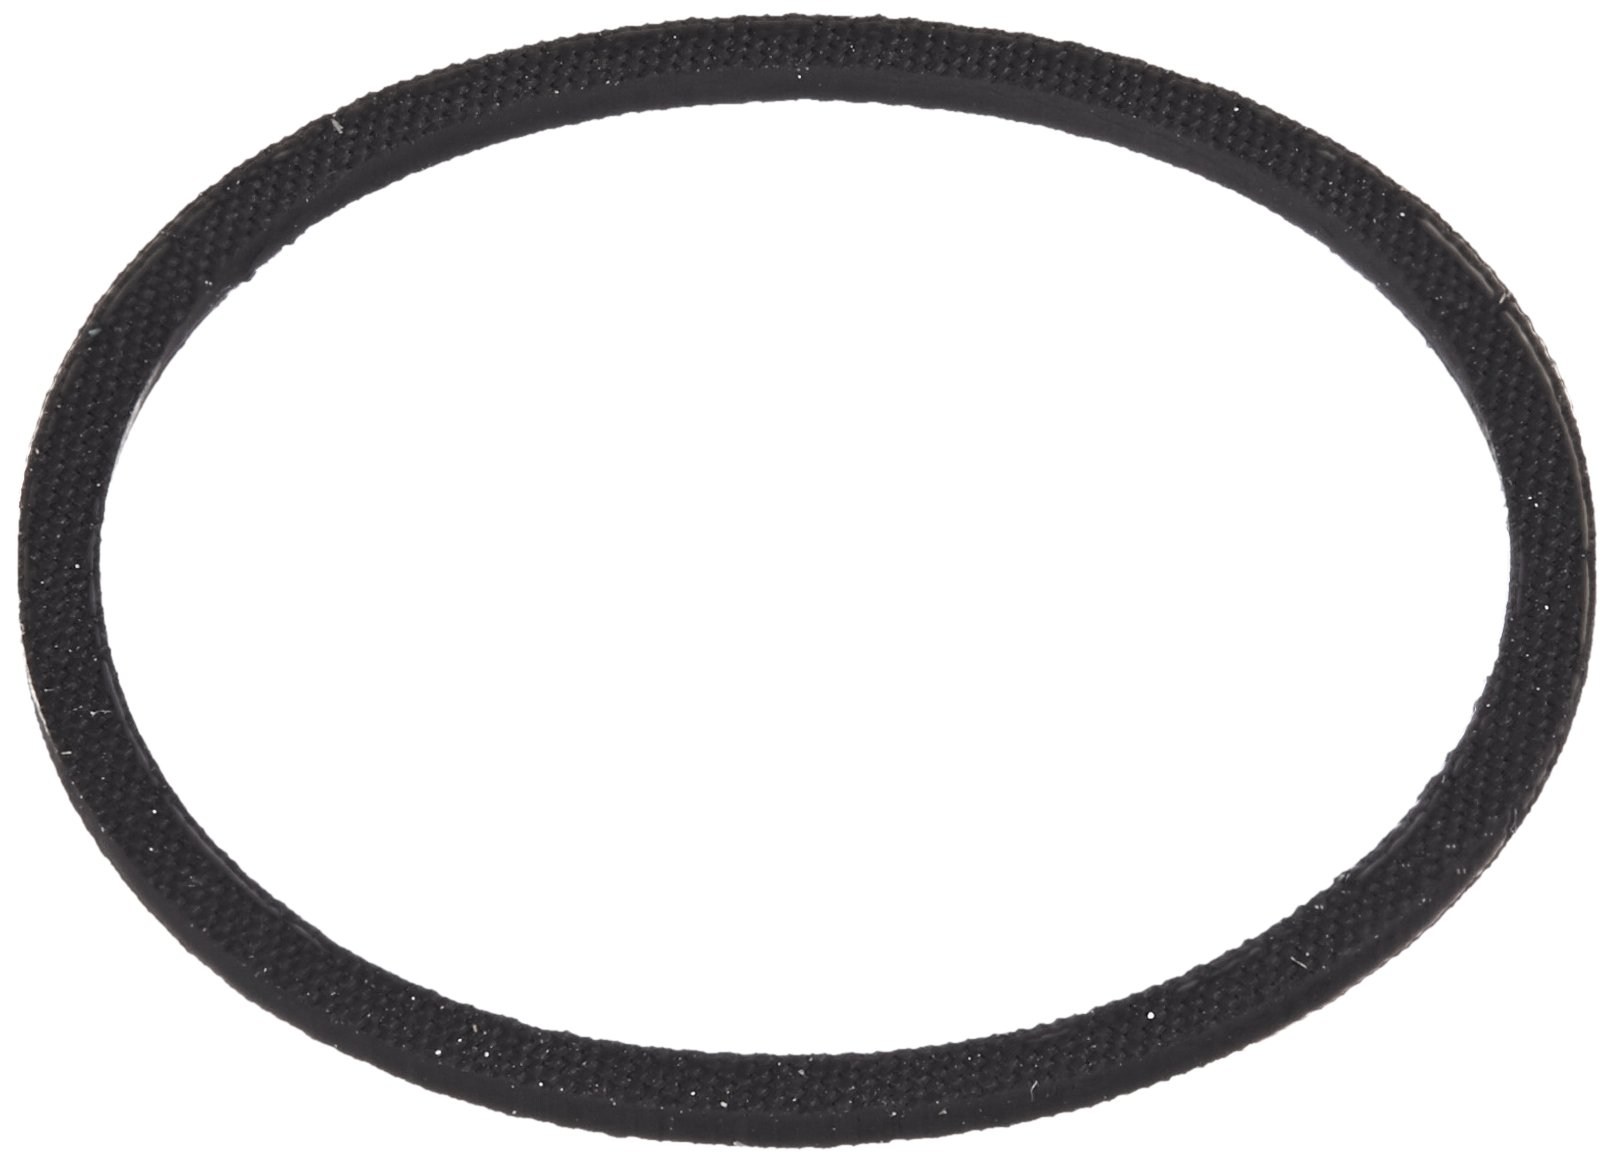 Koehler K13018 Petcock Lens Gasket for Chromometer (Pack of 12)